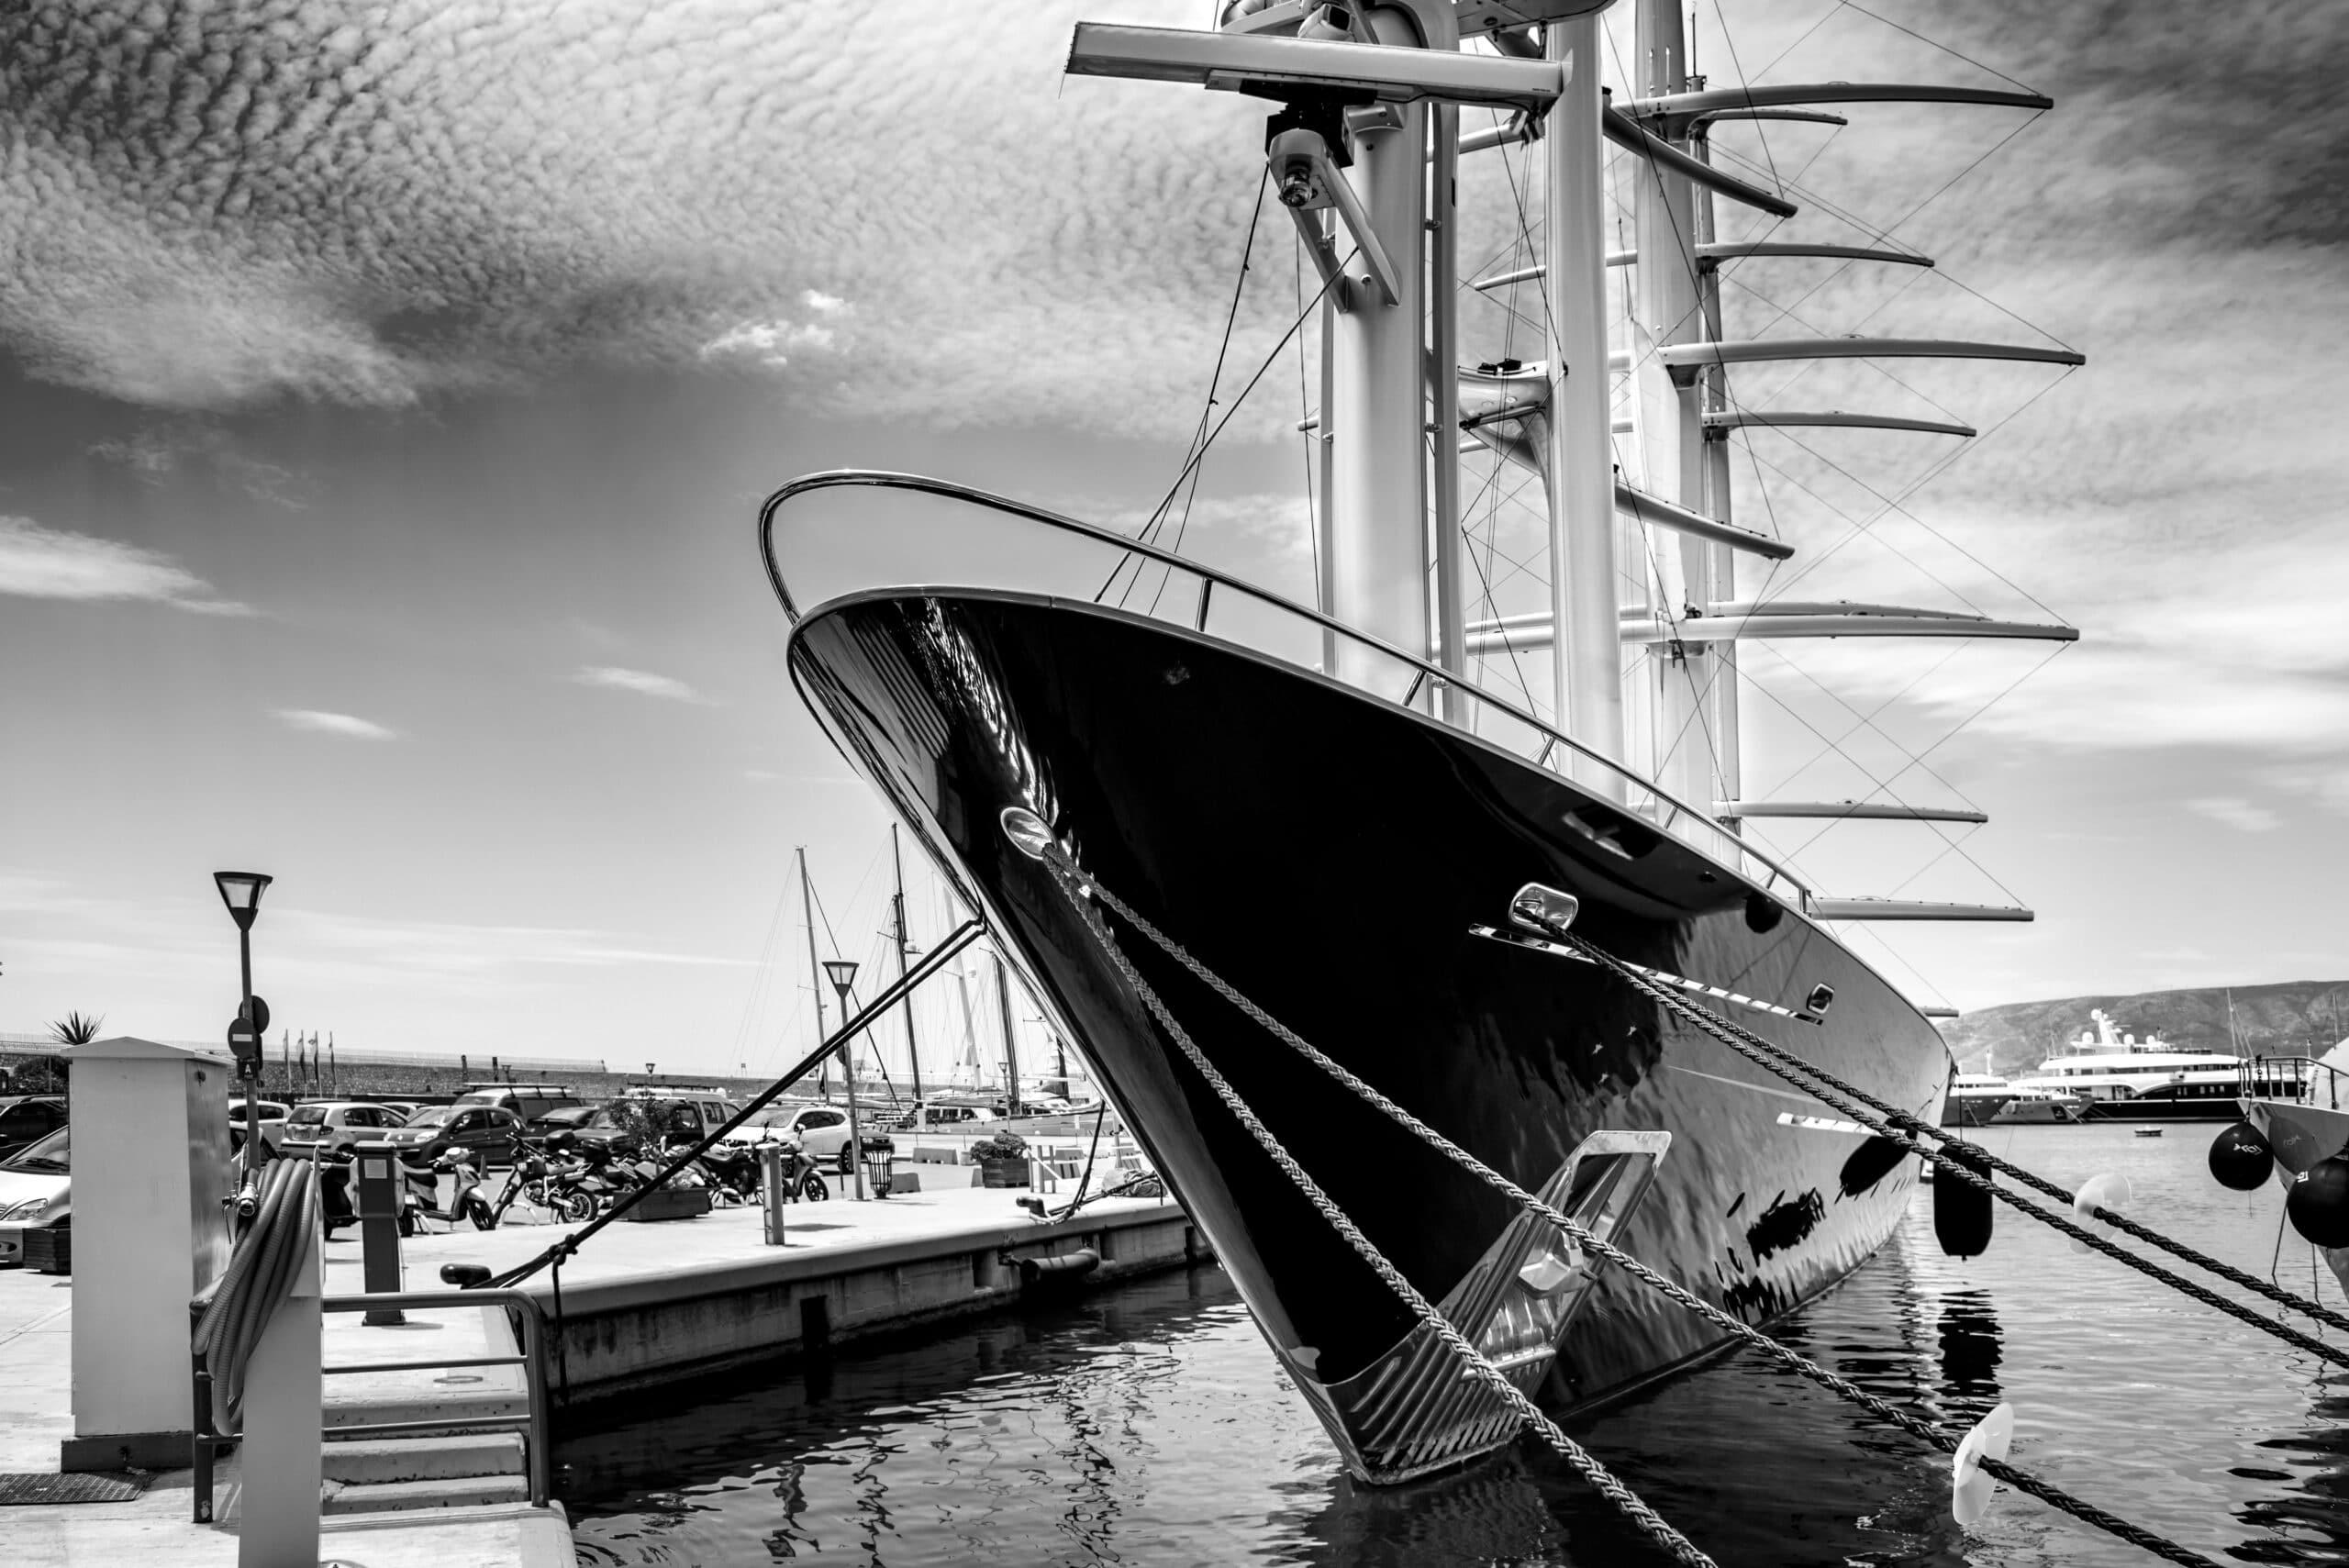 Luxury motor sail boat at marina Seas, Piraeus, Greece